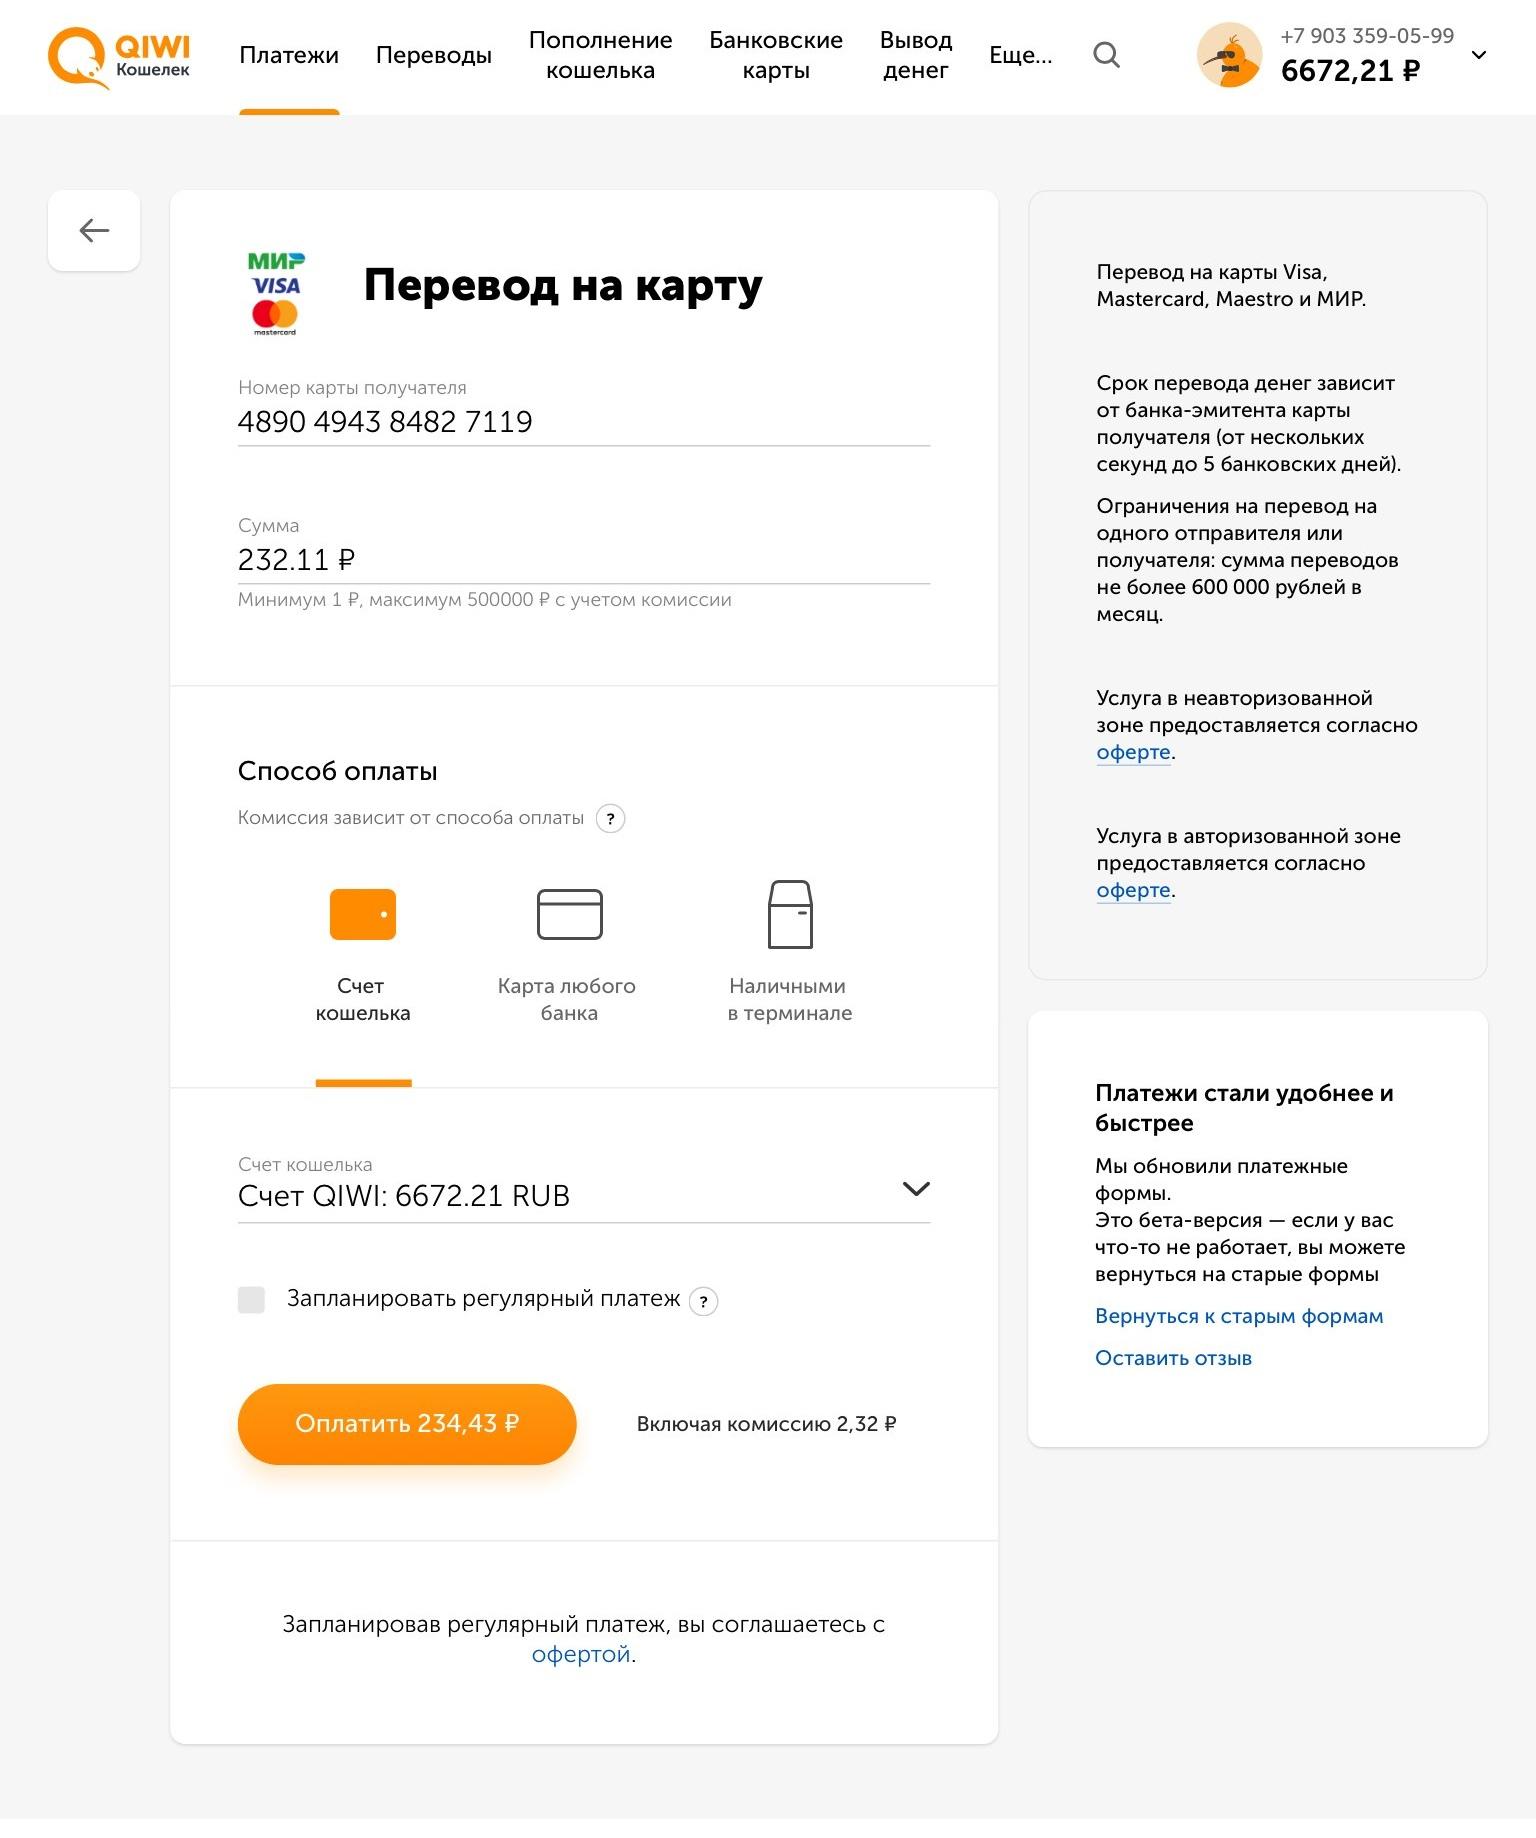 Kassa.cc - единый обмен валюты. Обмен QIWI RUB на BTC-e USD